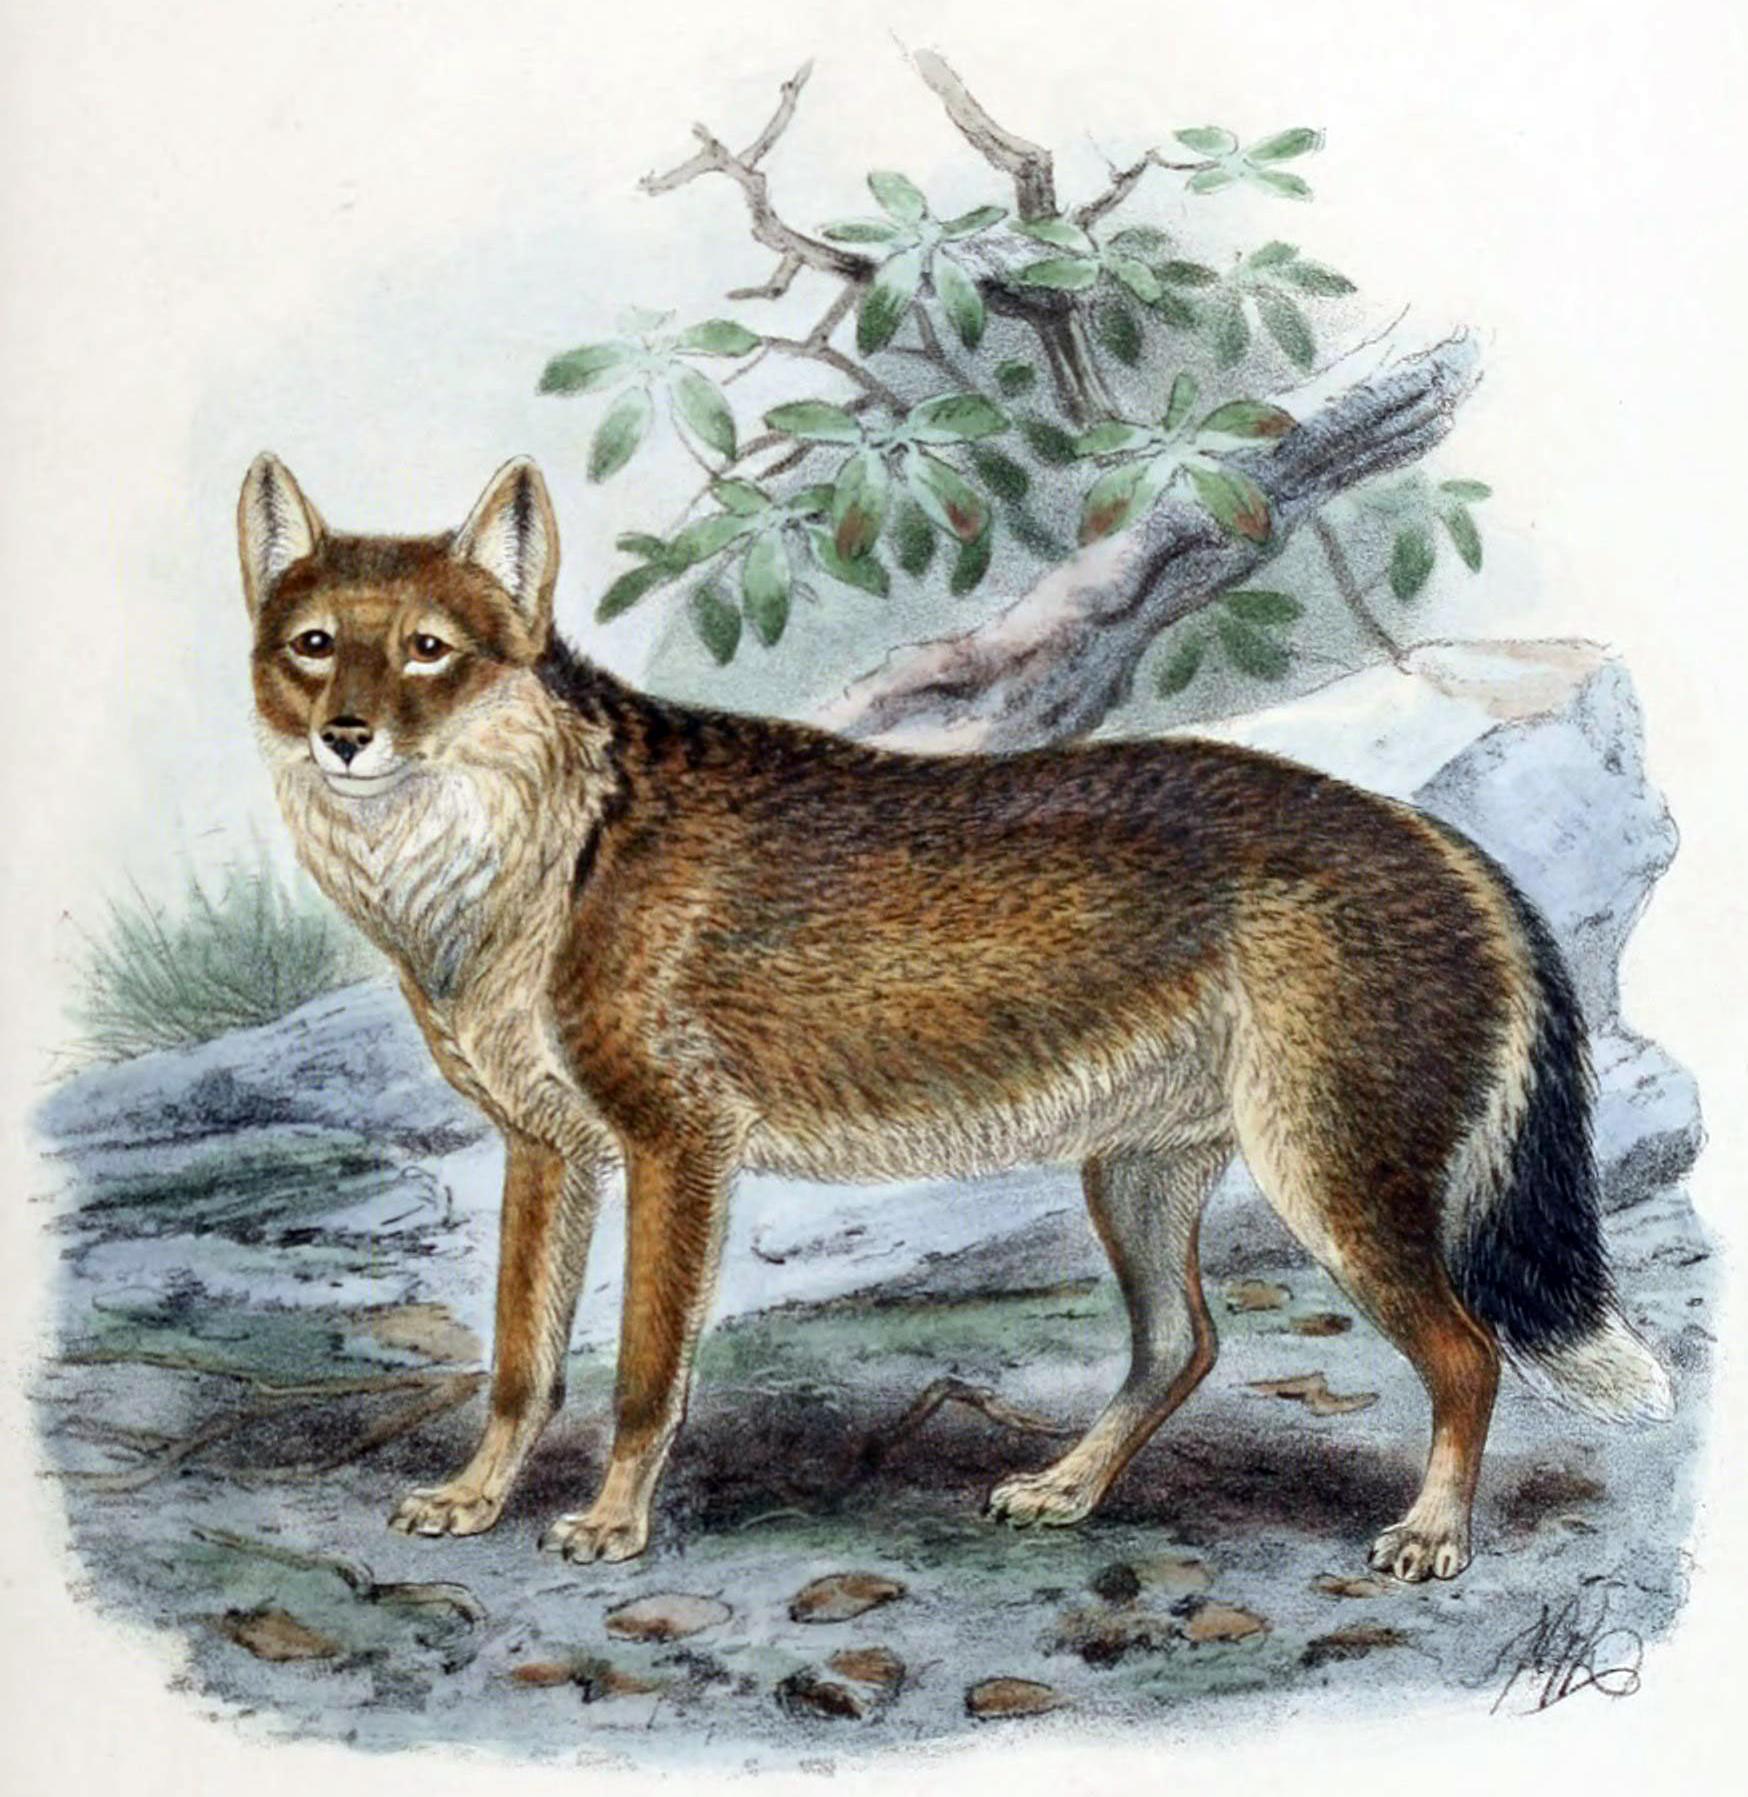 Di kepulauan Falkland atau Malvinas, ada serigala endemik ini pulsker. Letak pulau Falkland sangat terpencil, 500 km sebelah timur Argentina. Satwa yang terakhir mati di alam liar ditemukan pada 1876. Lalu, pada tahun 1868 dan 1870 dua serigala terakhir ini dibawa ke kebun binatang Inggris. Keduanya mati beberapa tahun kemudian. Kasihan ya pulsker?.